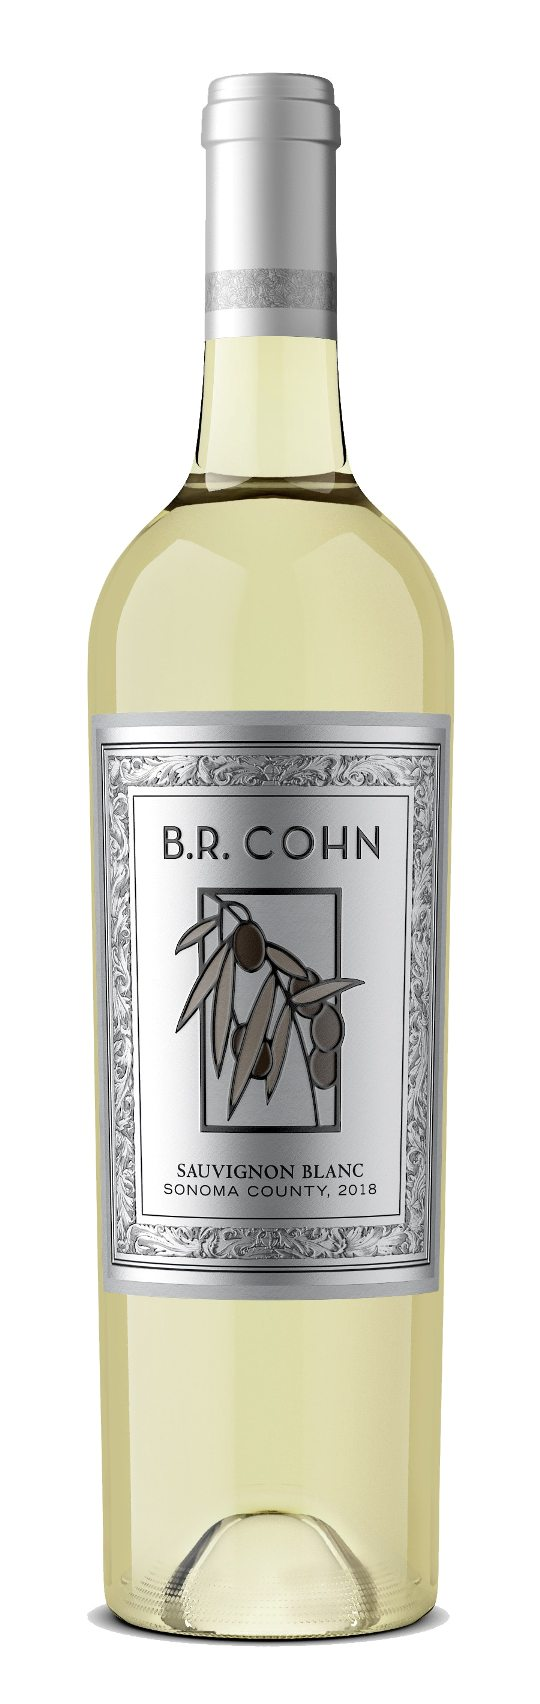 2018 Sonoma County Sauvignon Blanc